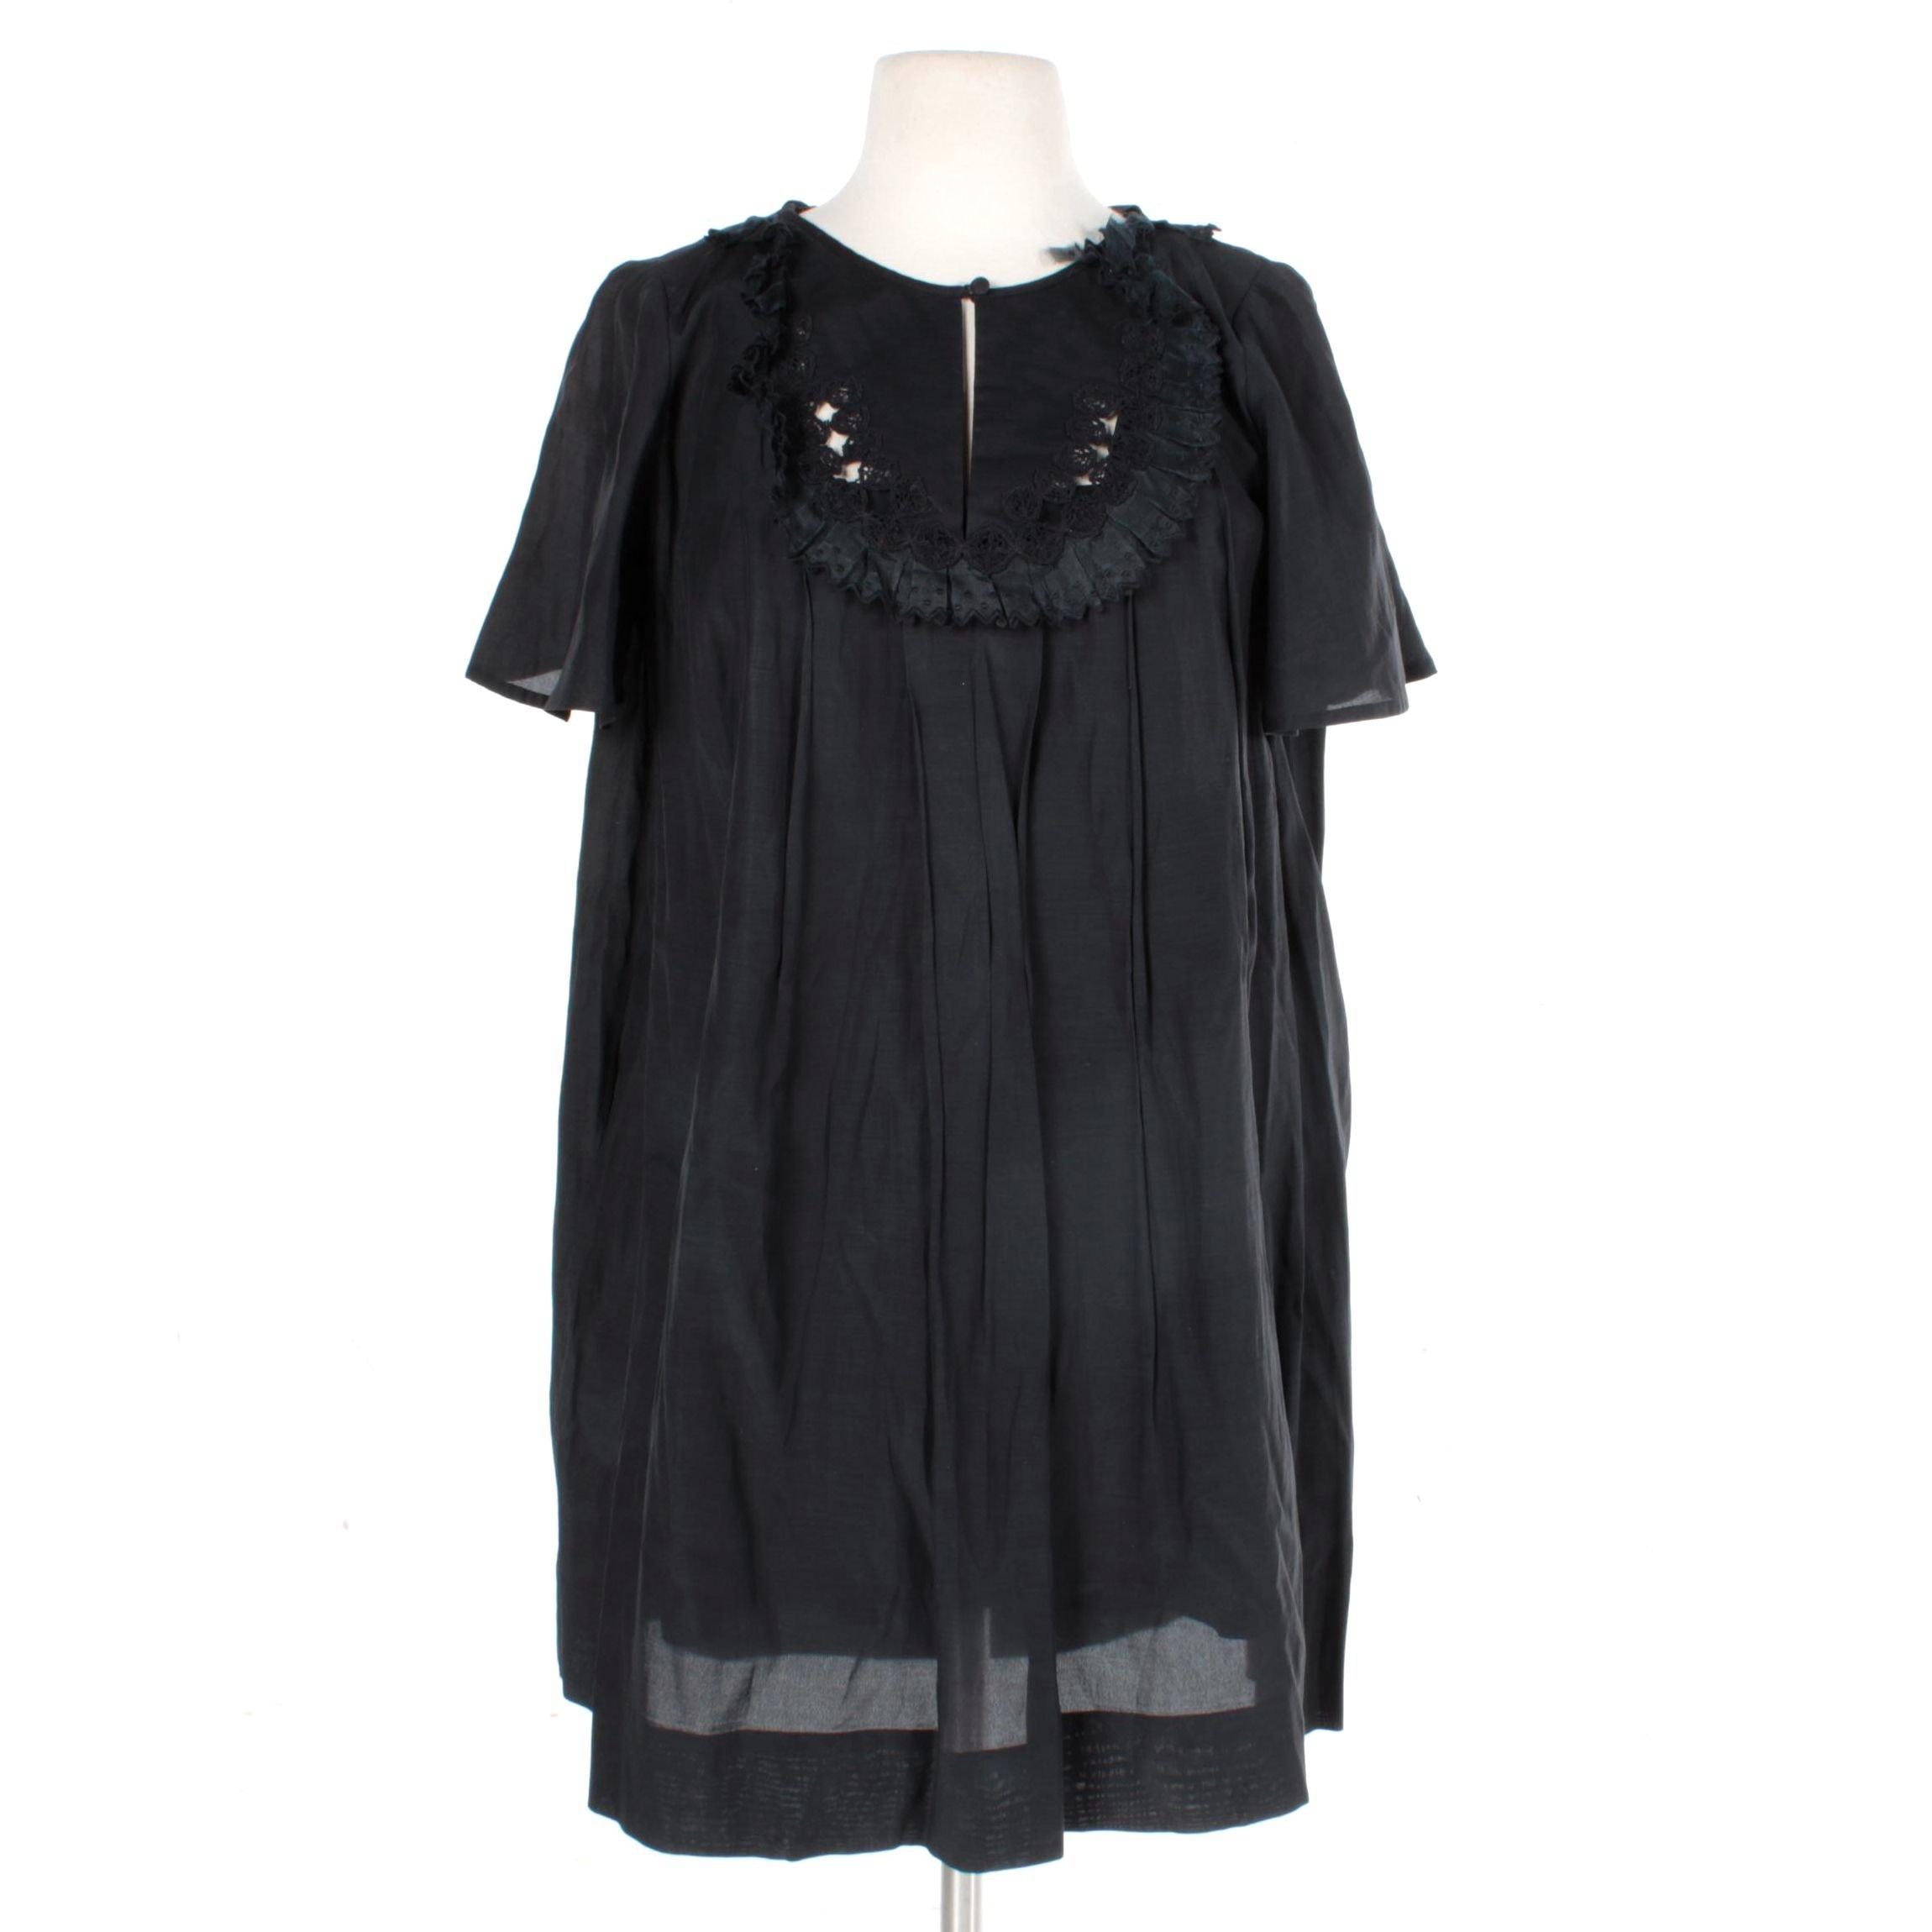 Women's 3.1 Phillip Lim Dress